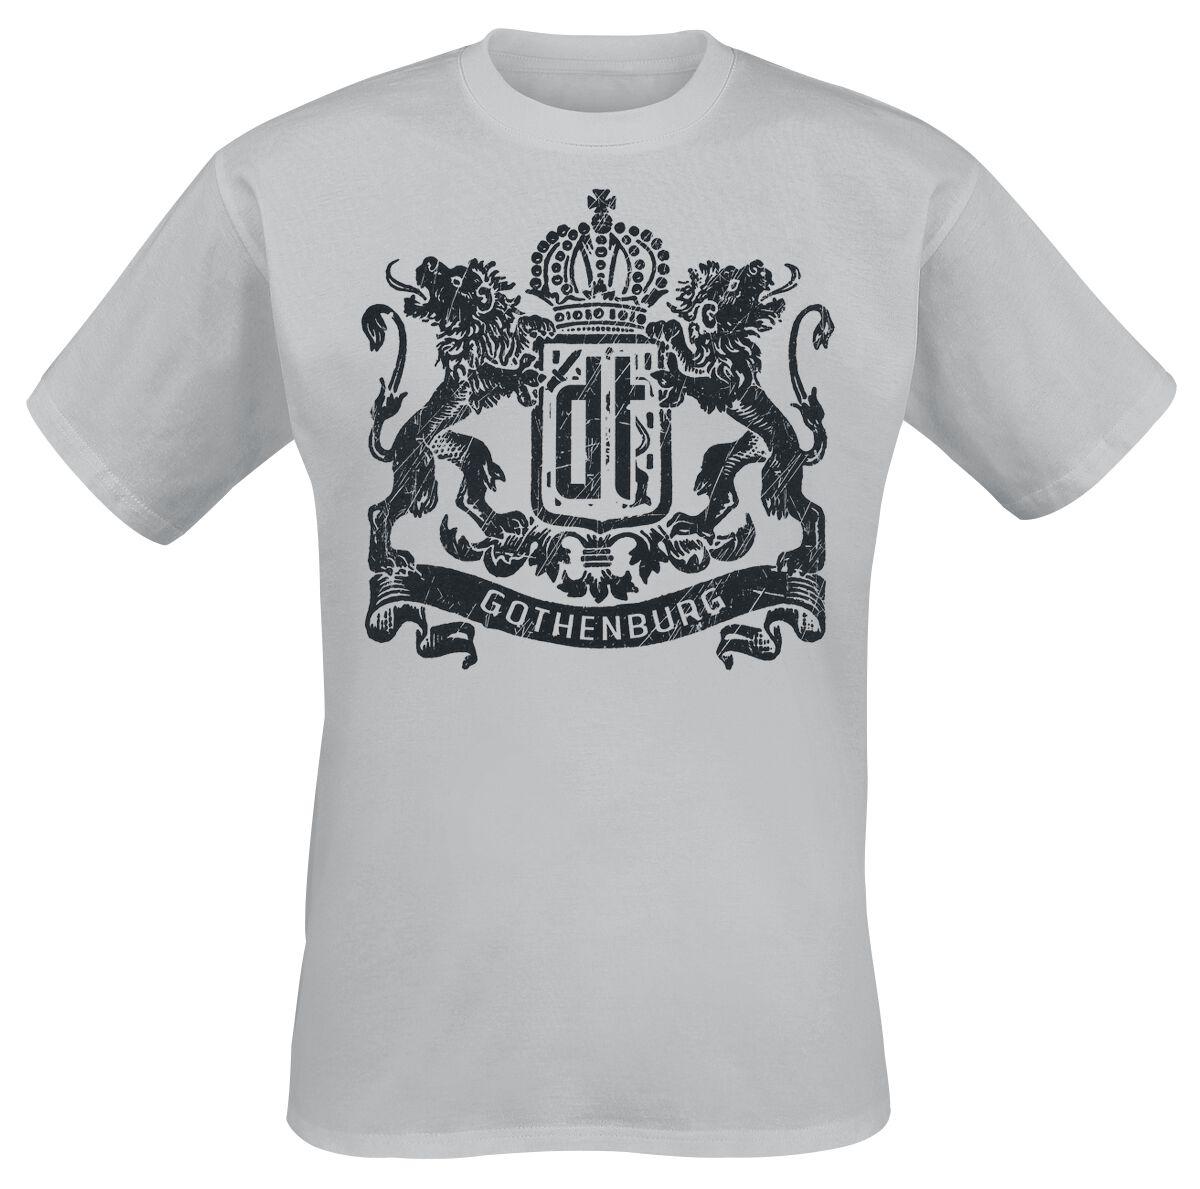 Zespoły - Koszulki - T-Shirt Dark Tranquillity Gothenburg T-Shirt ciemnoszary - 365254